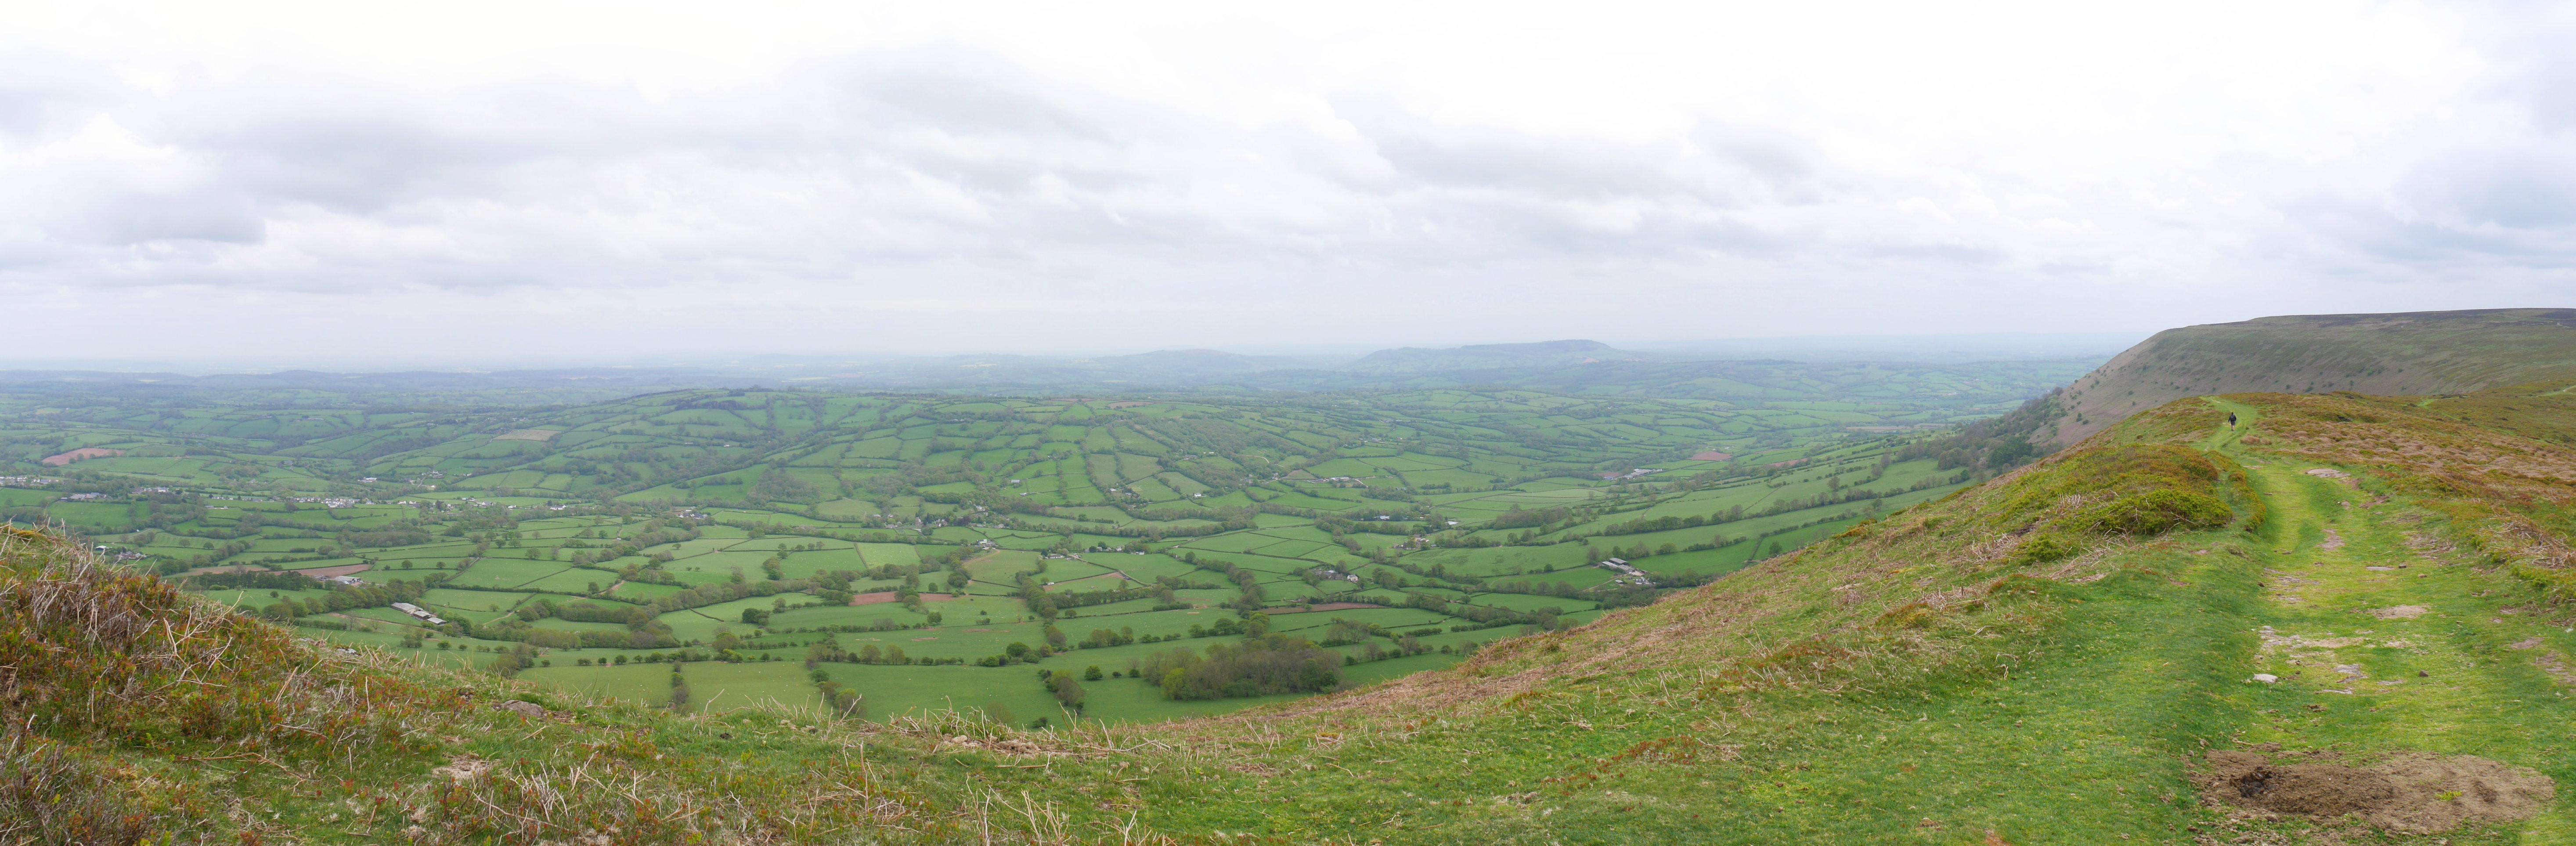 Beautiful views from Hatterall Ridge